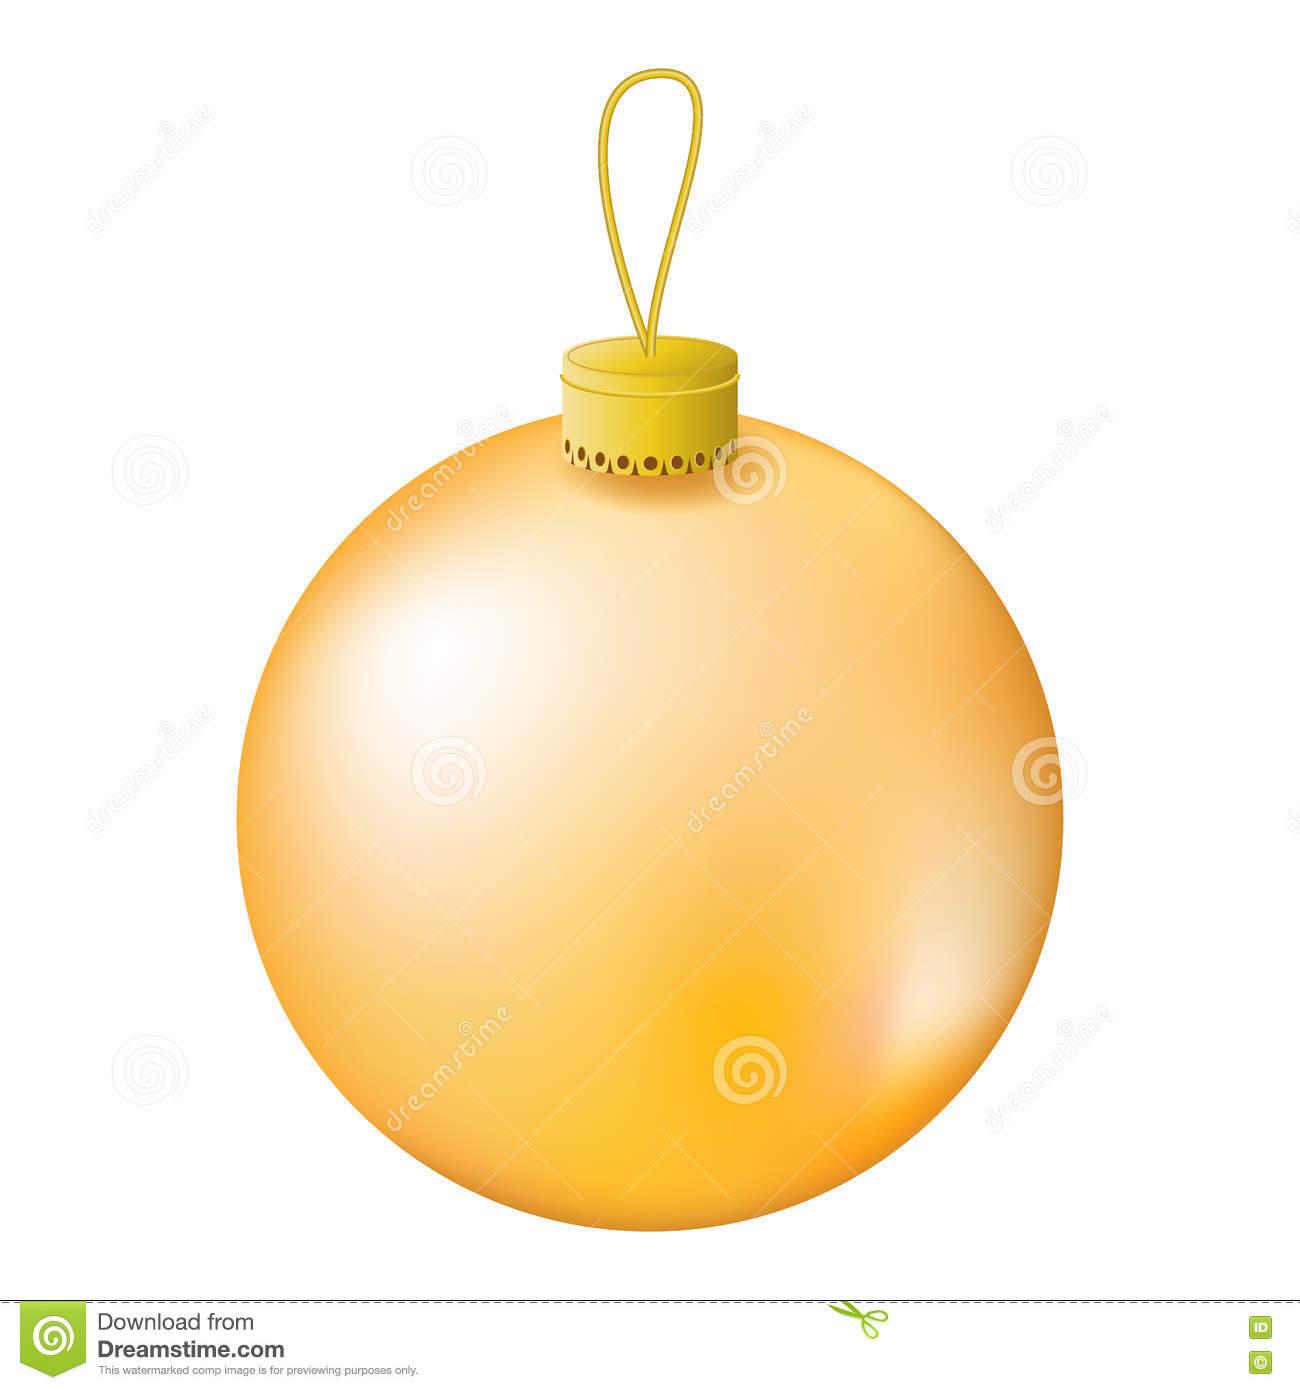 Gold Christmas Tree Ball Realistic Illustration. Stock Illustration.